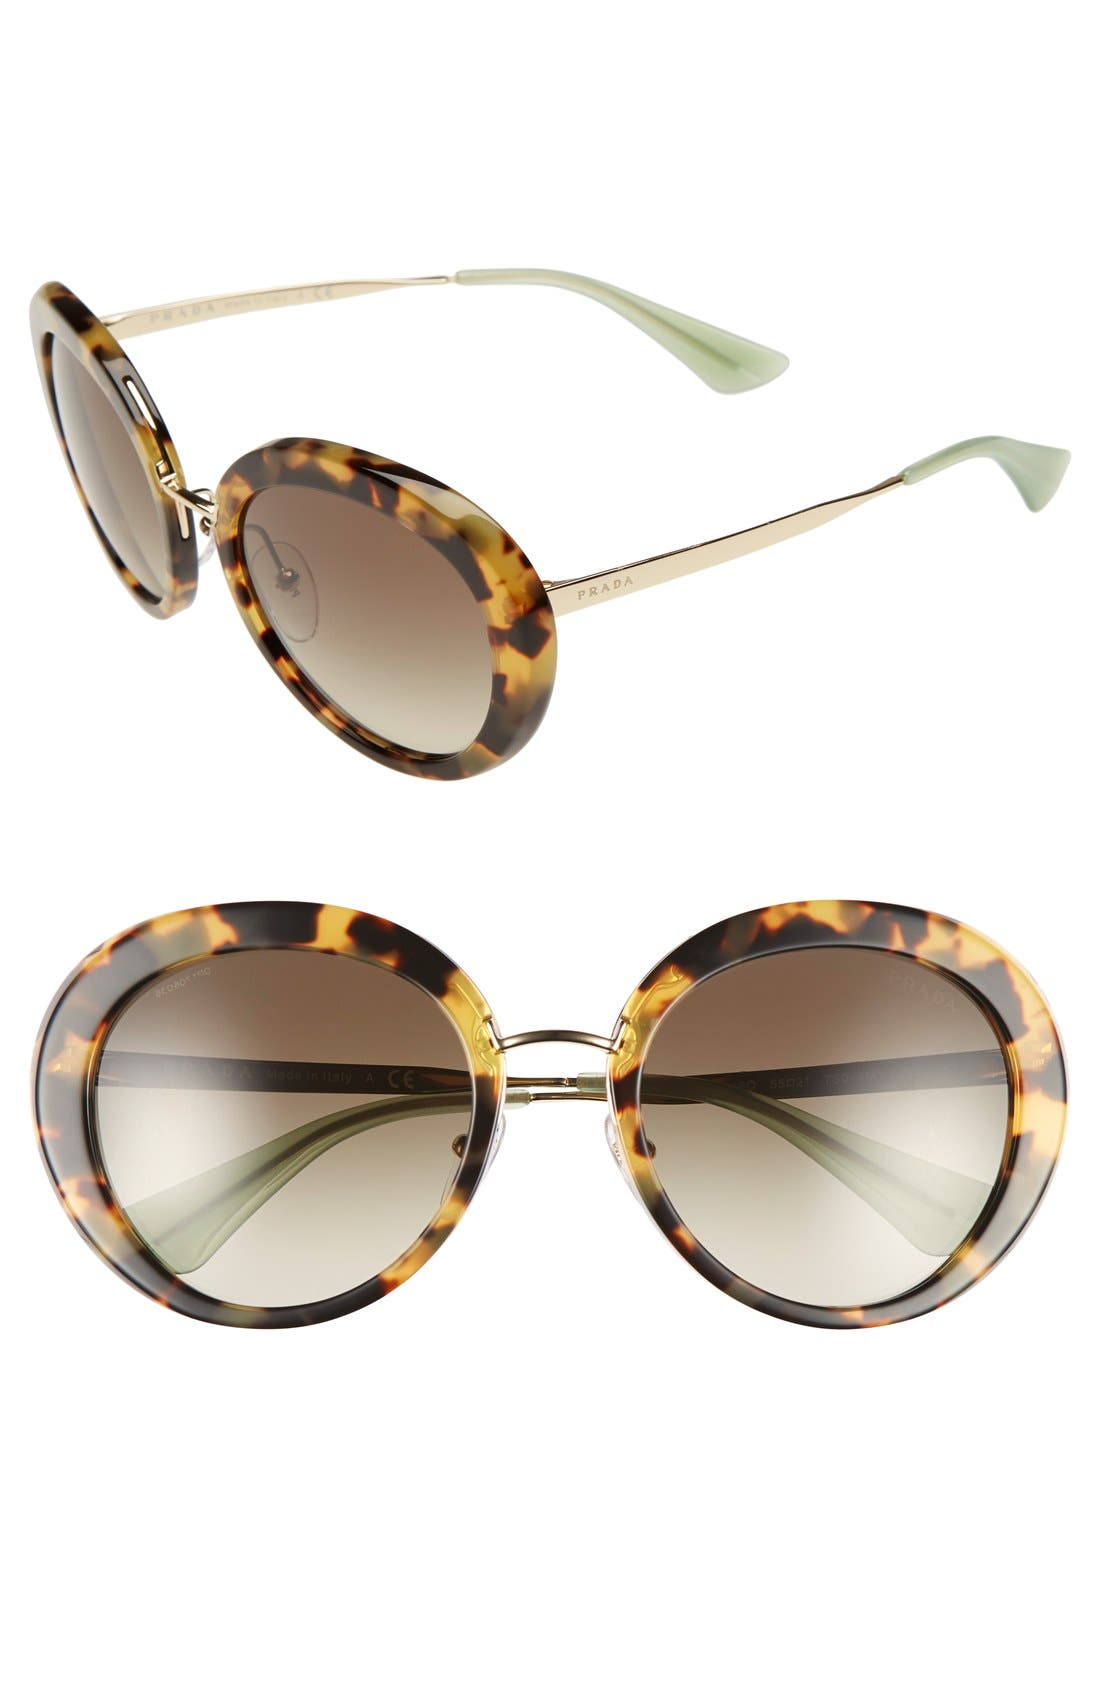 55mm Round Sunglasses,                             Main thumbnail 1, color,                             200